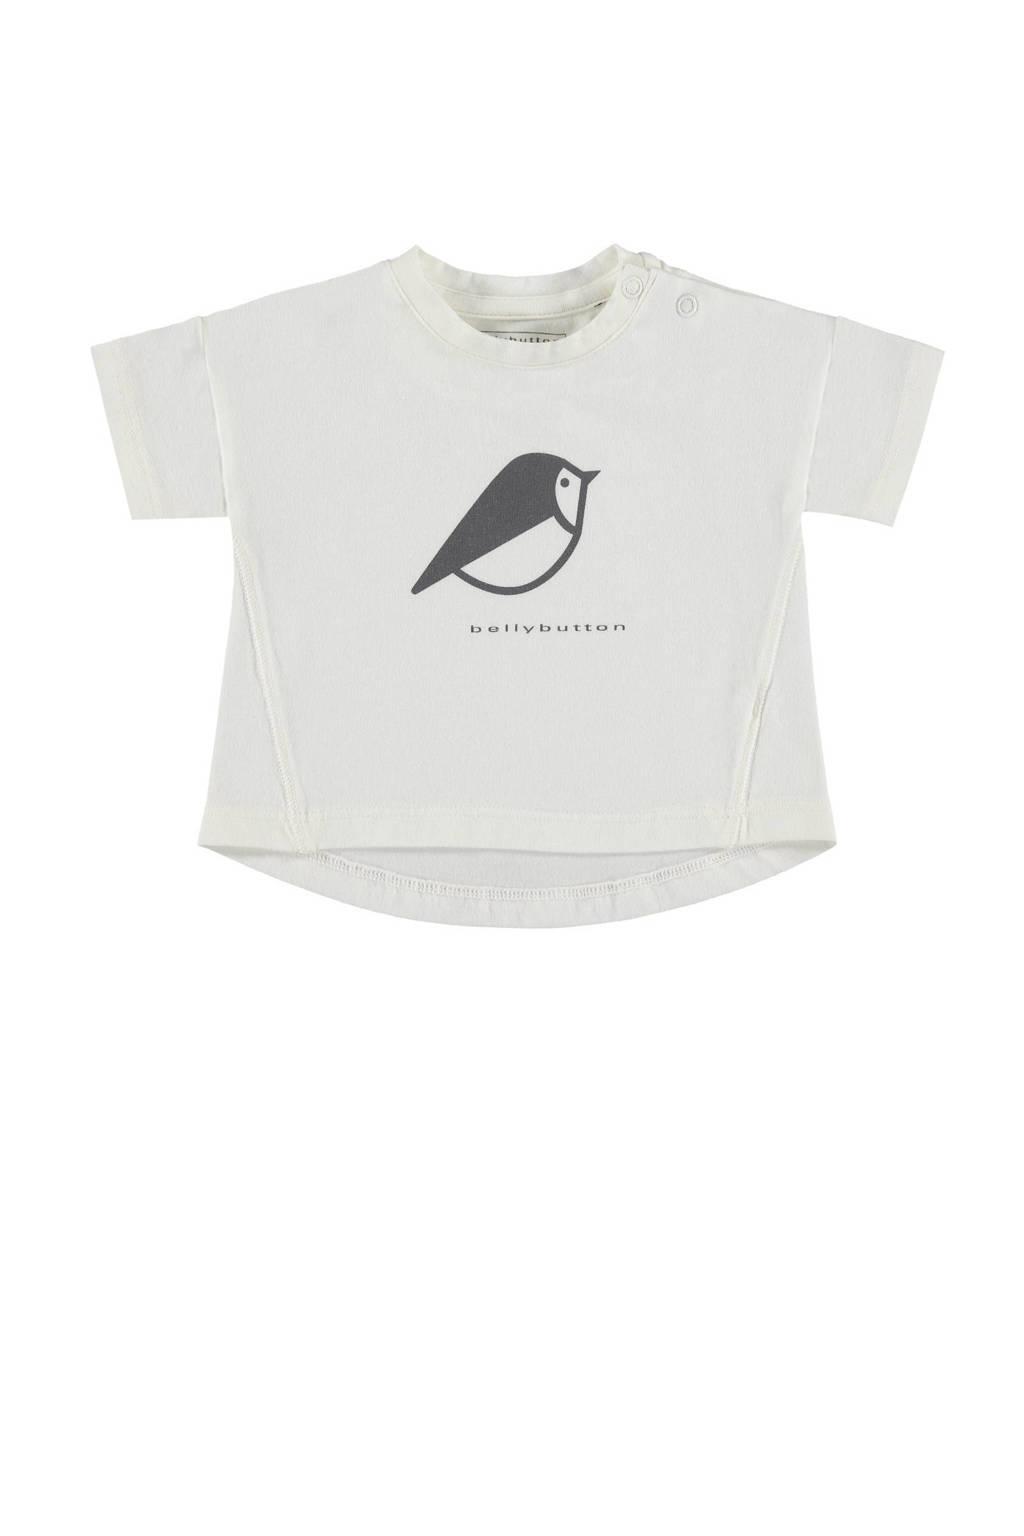 bellybutton T-shirt, naturel wit